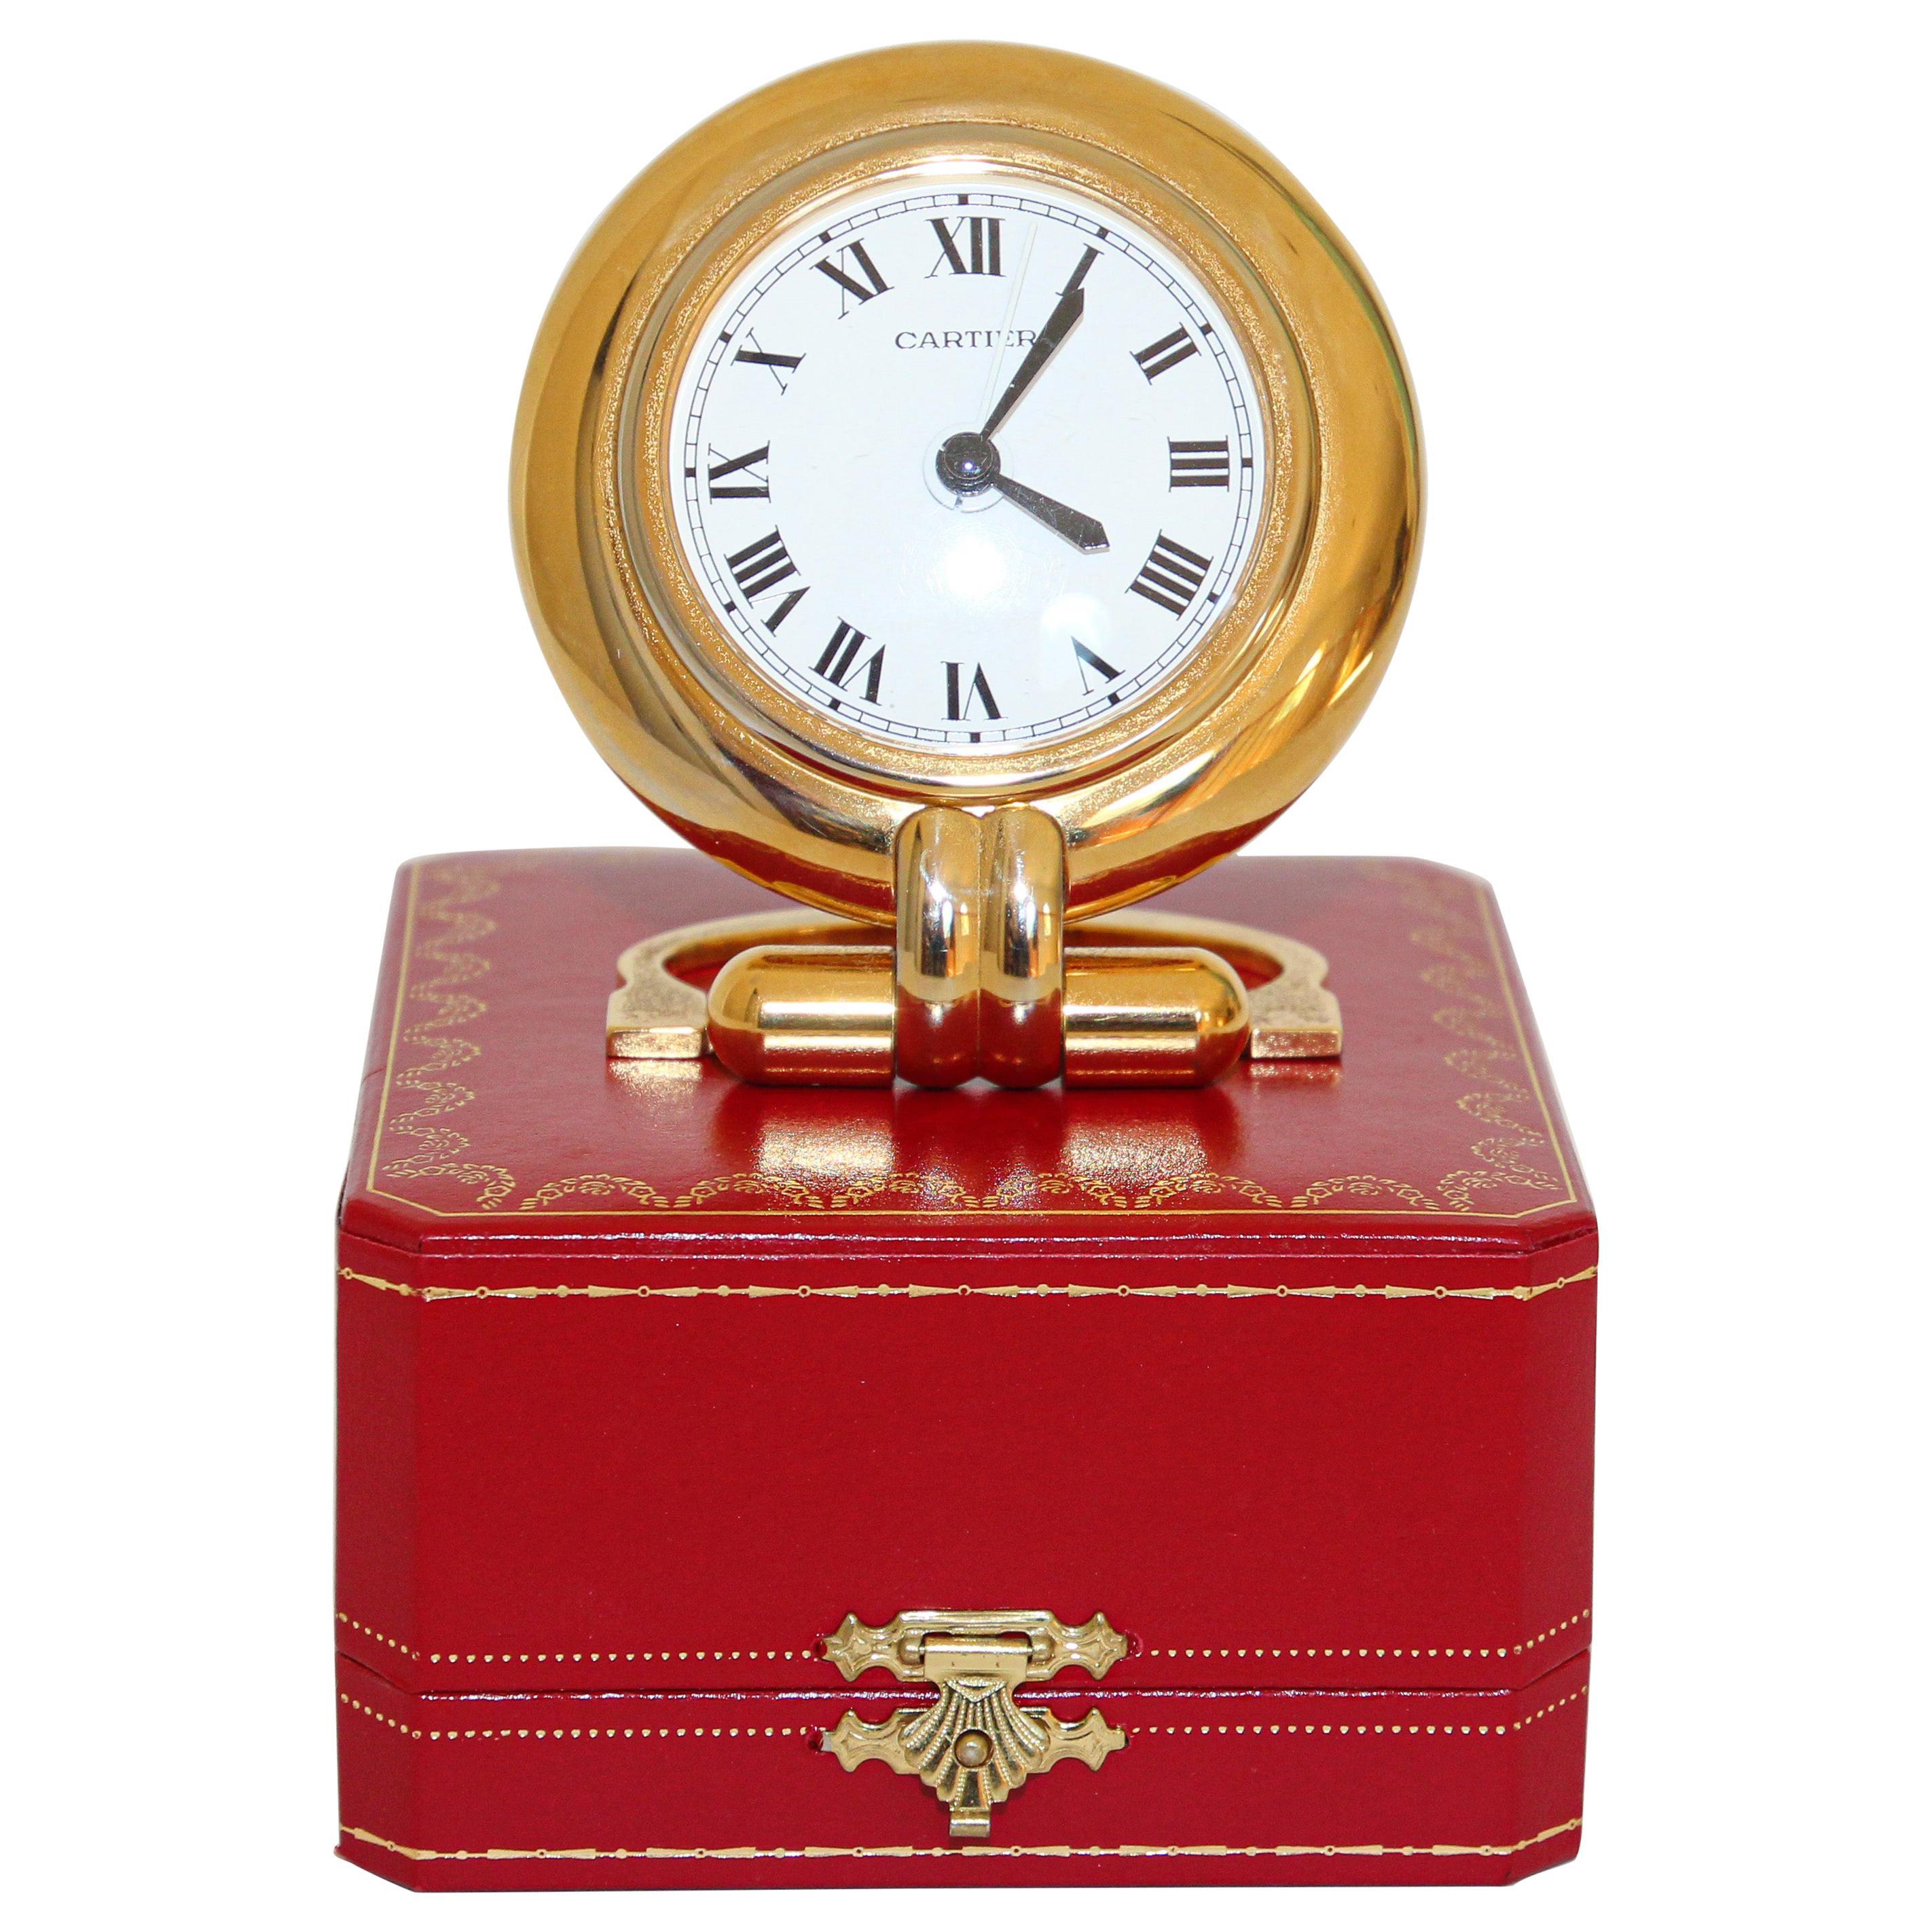 Cartier Art Deco Travel Quartz 24-Karat Gold-Plated Desk Clock Vintage